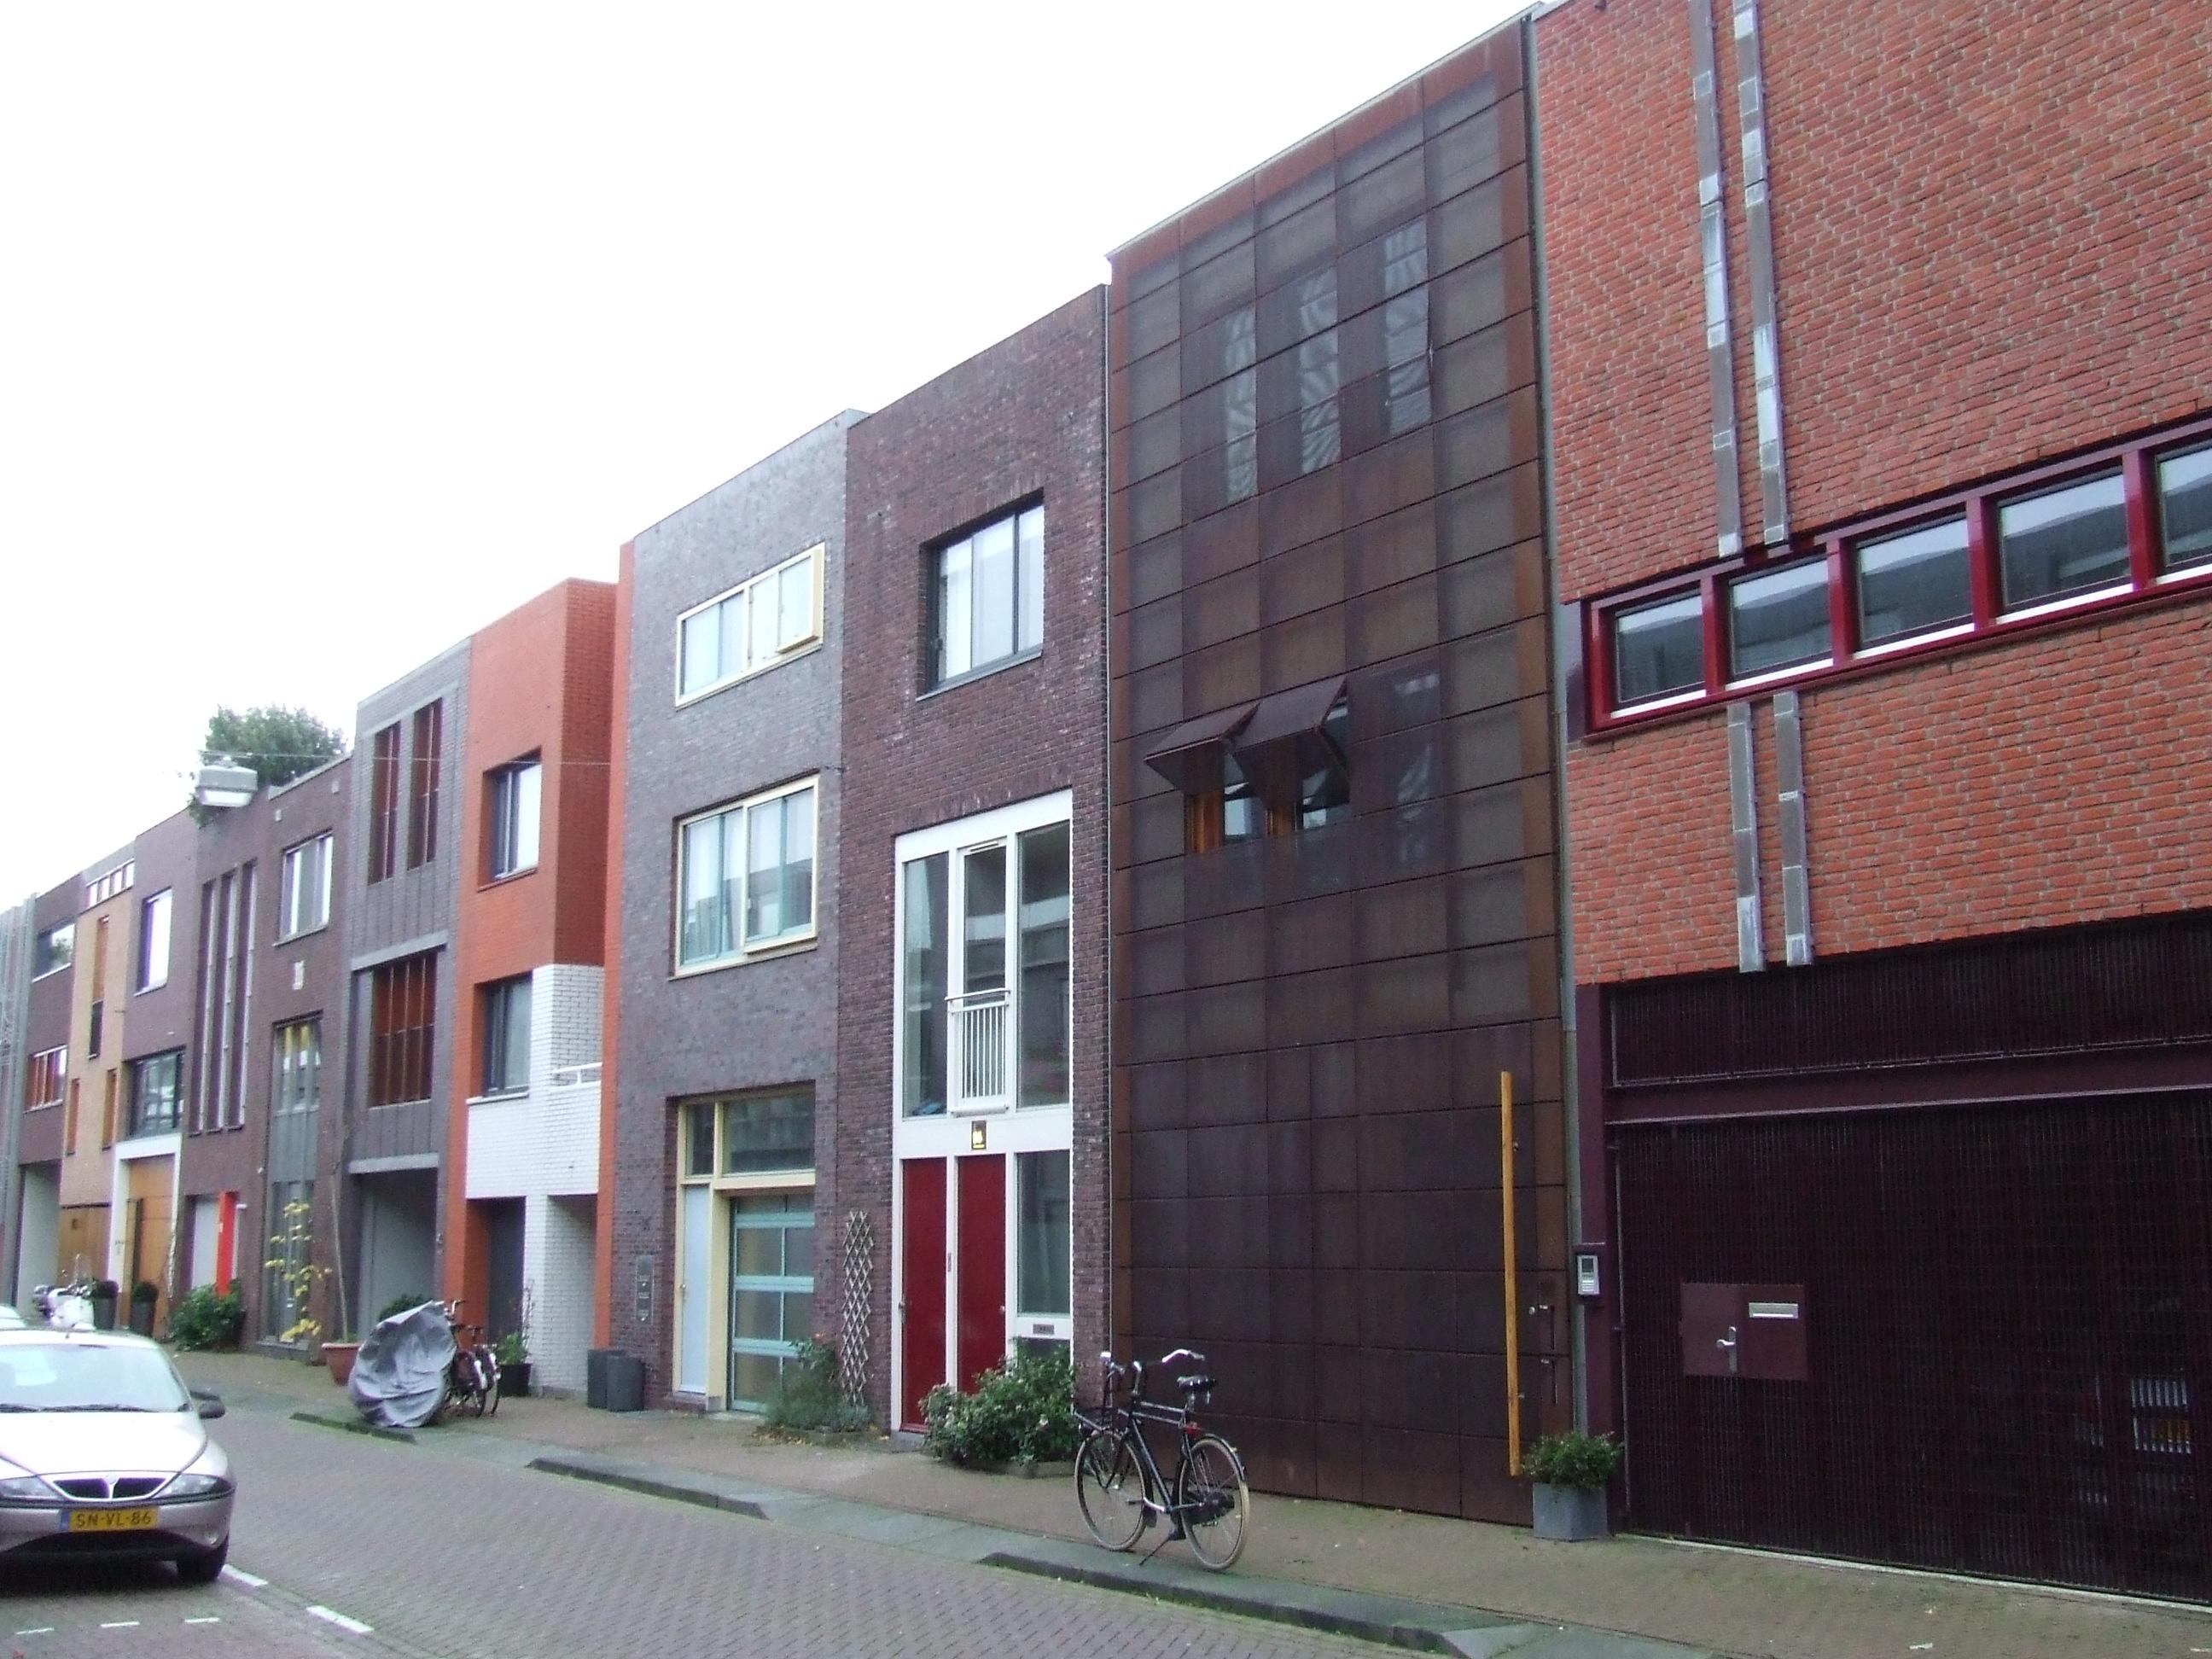 townhouse center small urban building photo parade part 2